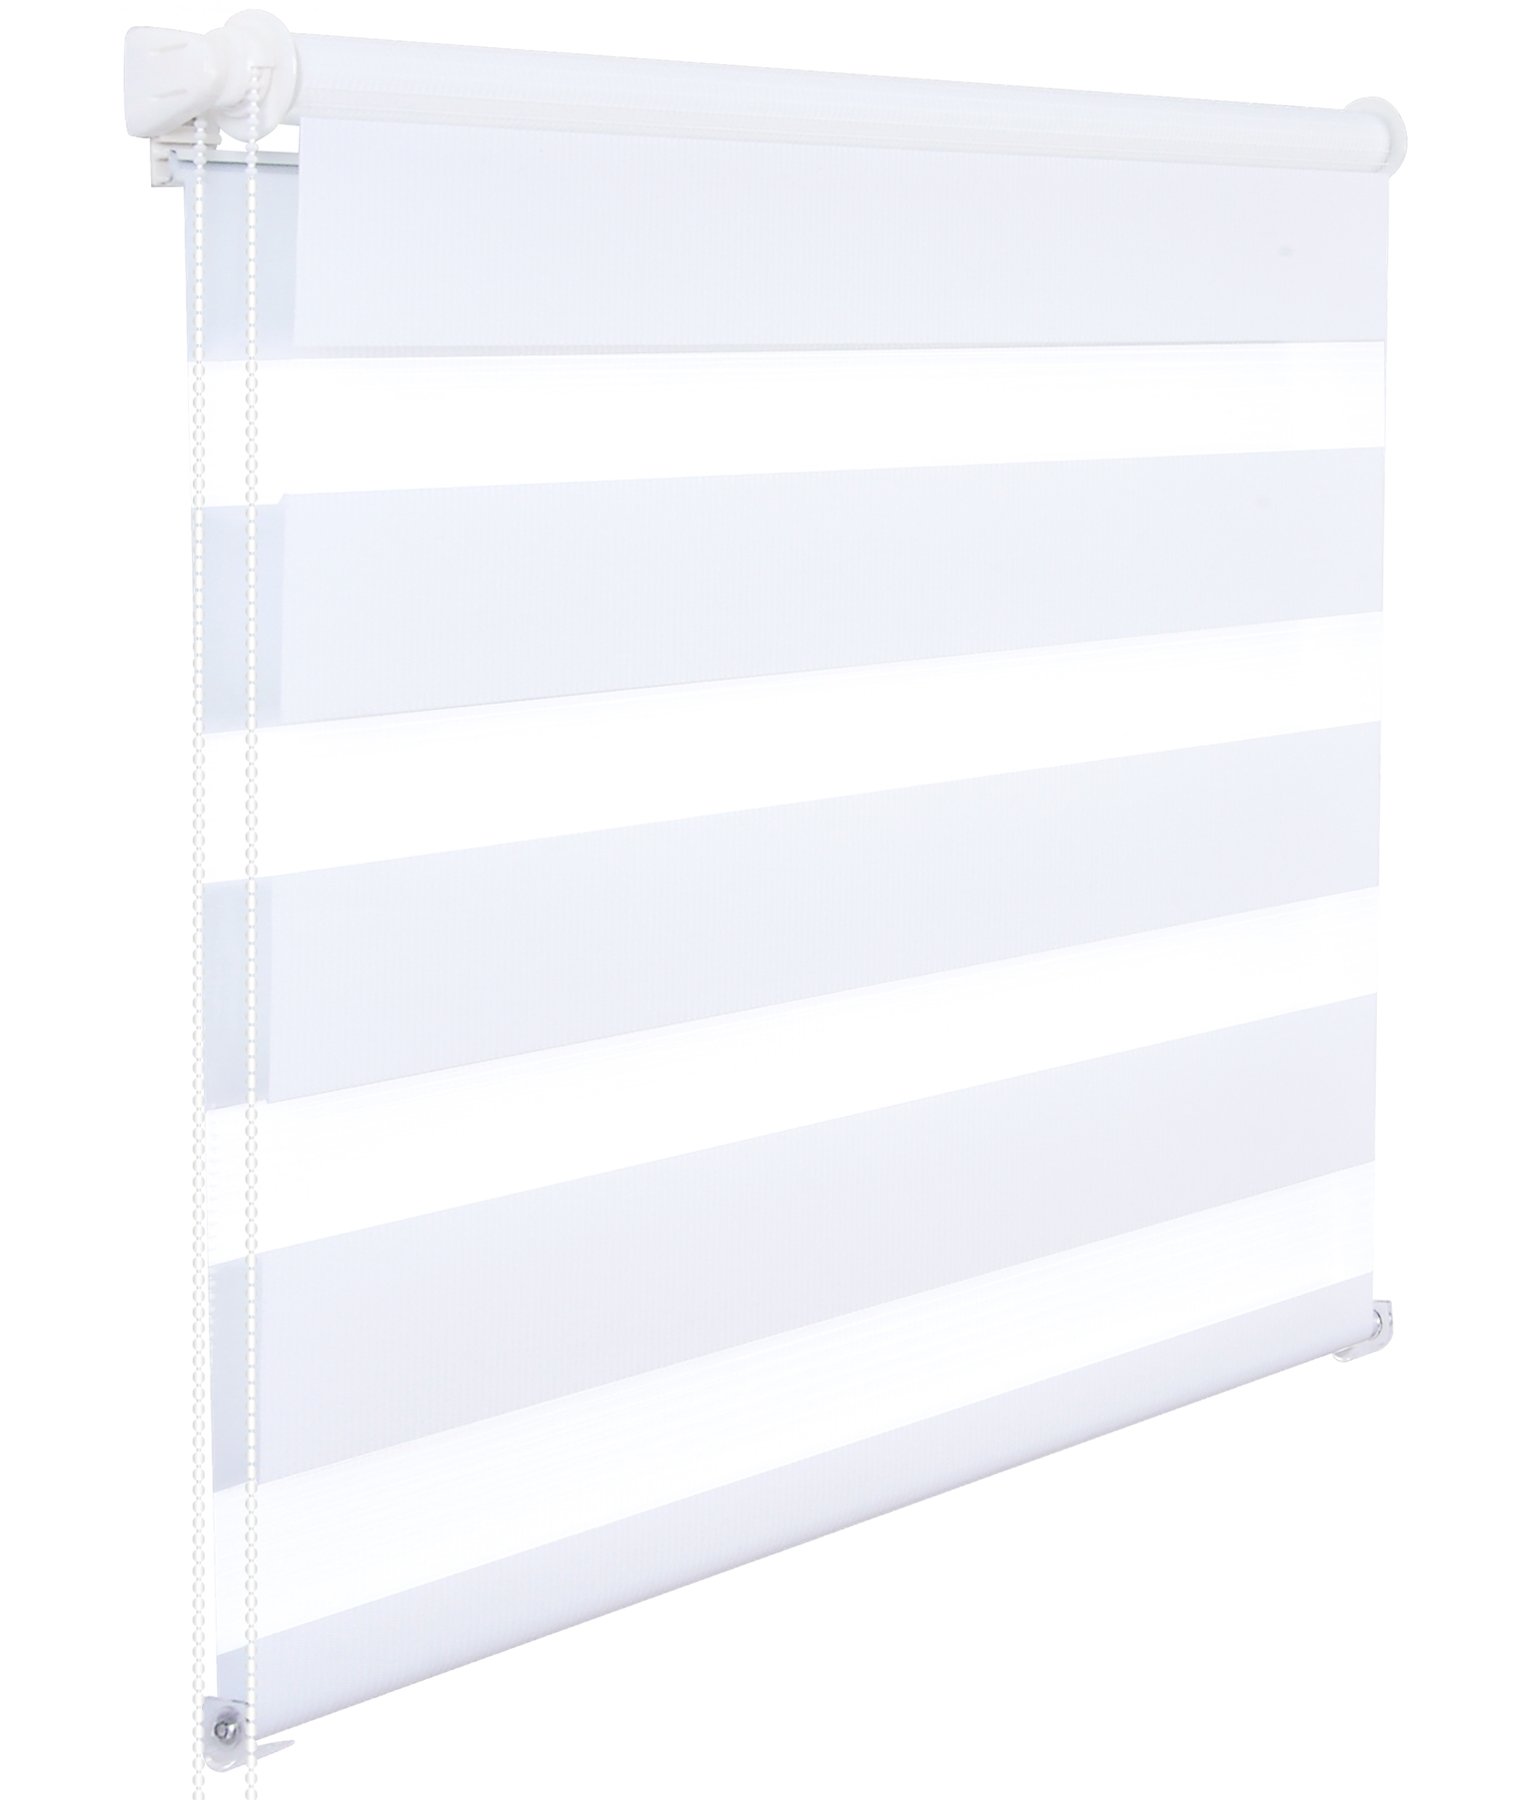 Doppelrollo-Duo-Rollo-Klemmfix-ohne-Bohren-Easyfix-Fenster-Seitenzugrollo-324